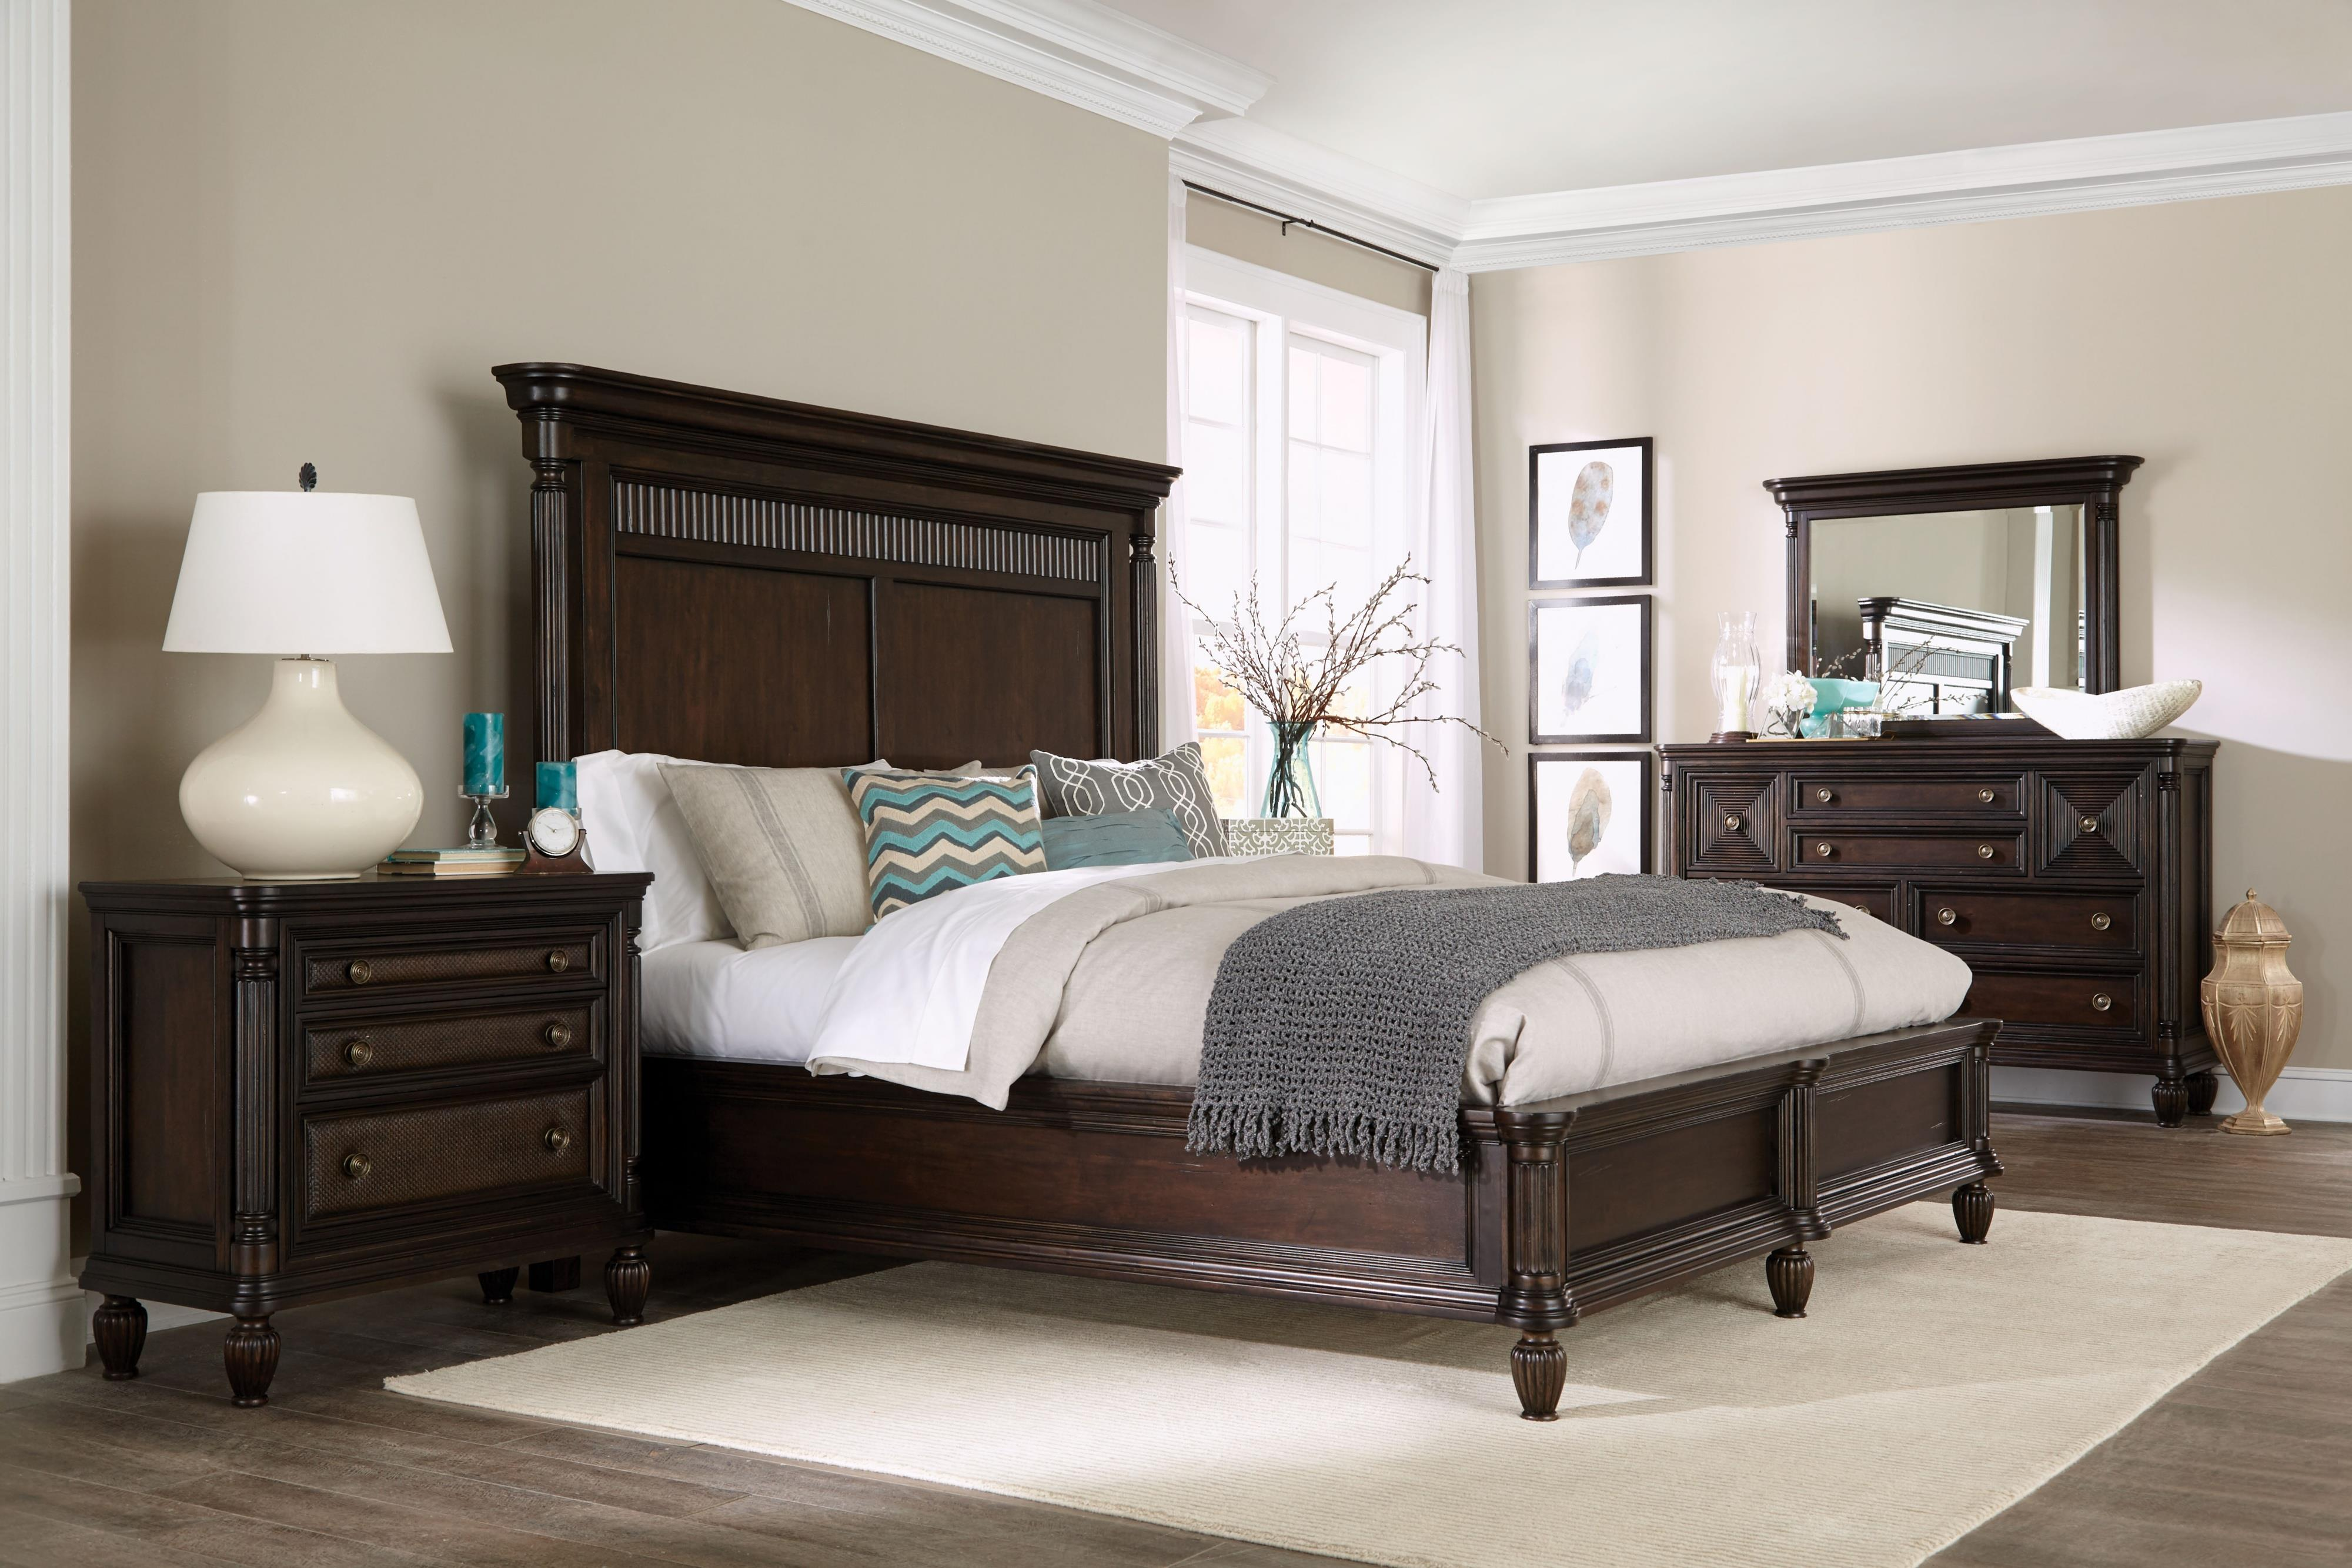 Broyhill Furniture Jessa King Bedroom Group 1 - Item Number: 4980 K Bedroom Group 1